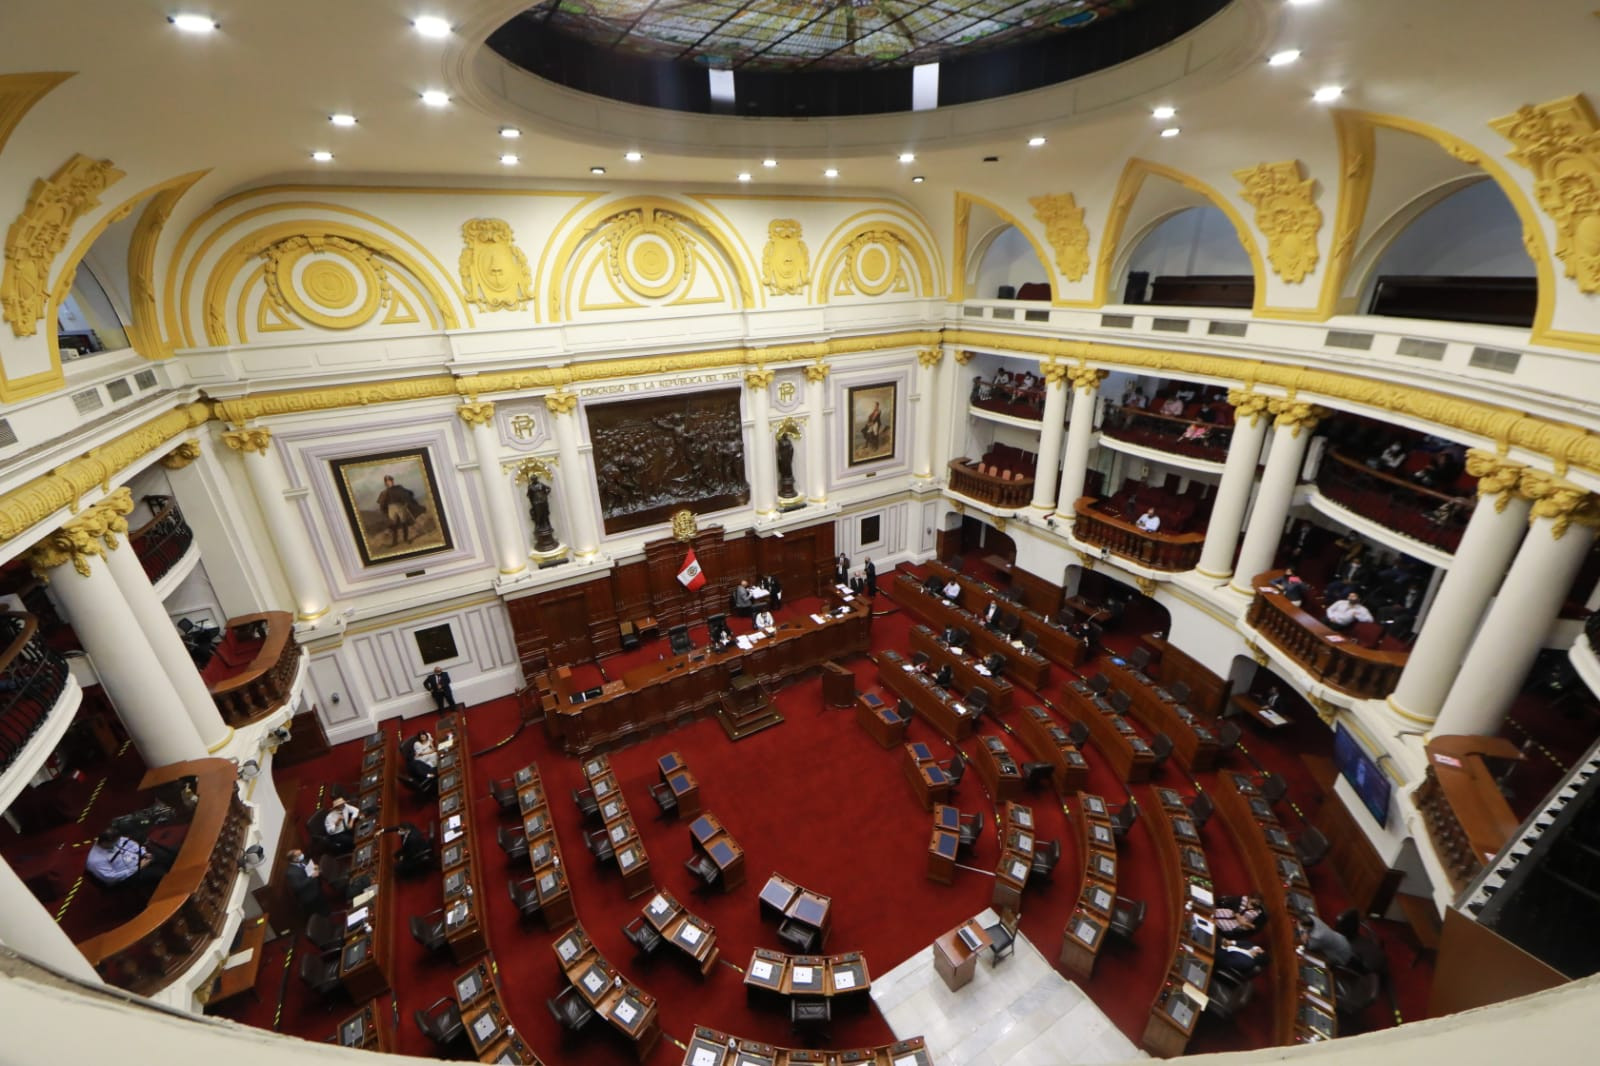 congreso-sometio-a-debate-derogacion-de-ley-de-promocion-agraria